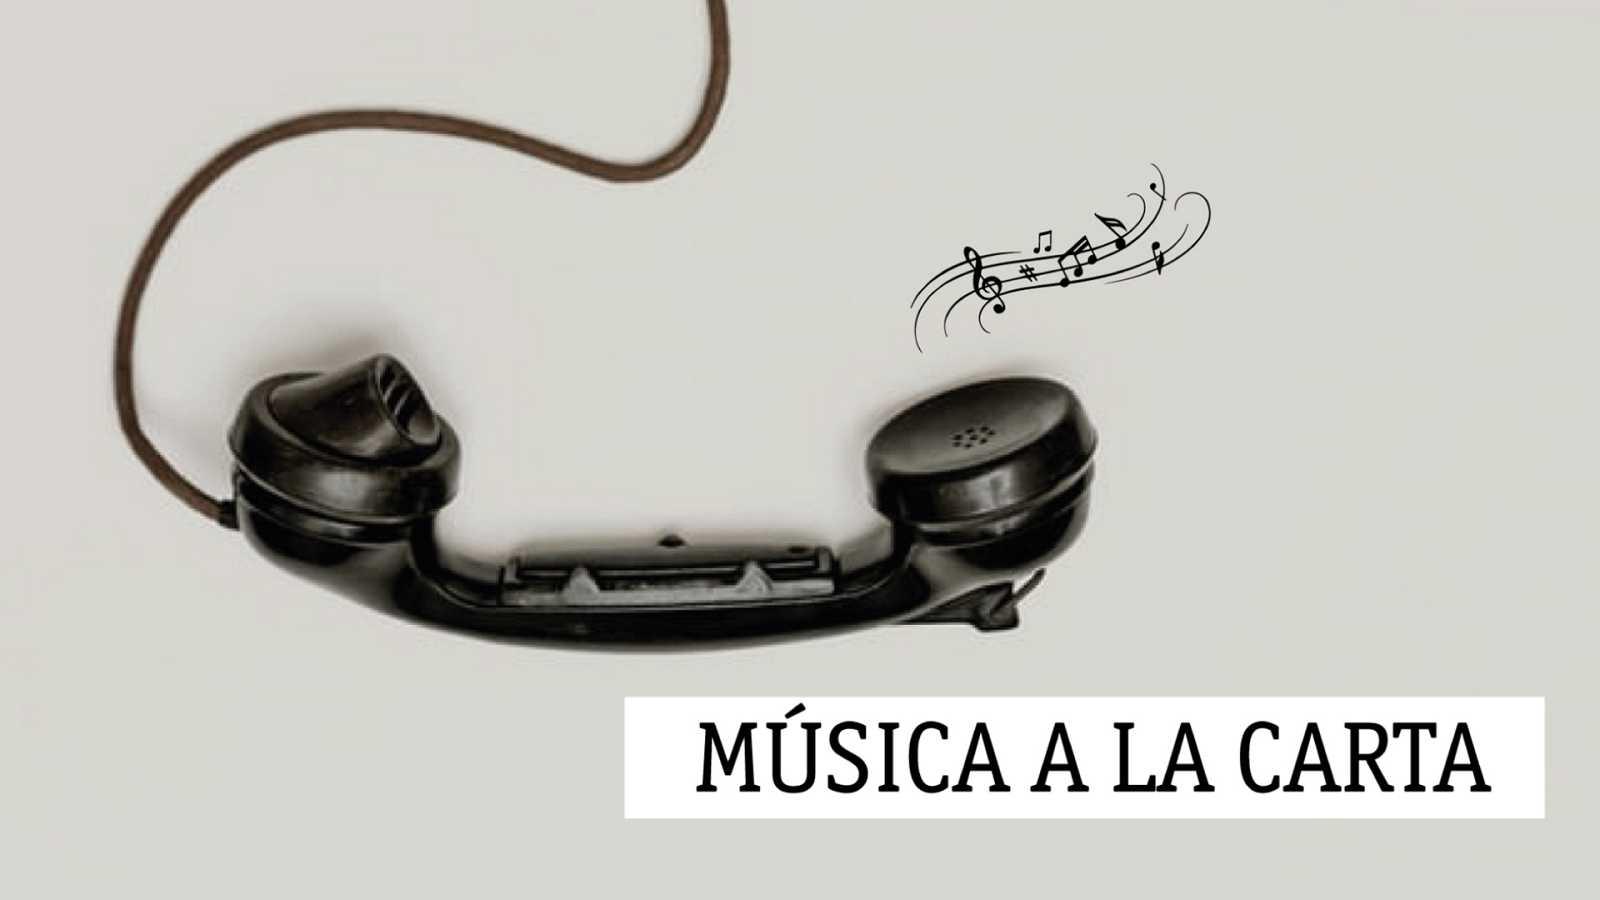 Música a la carta - Mozart, Beethoven, Schubert, Sarasate y De la Viña - 03/06/20 - escuchar ahora